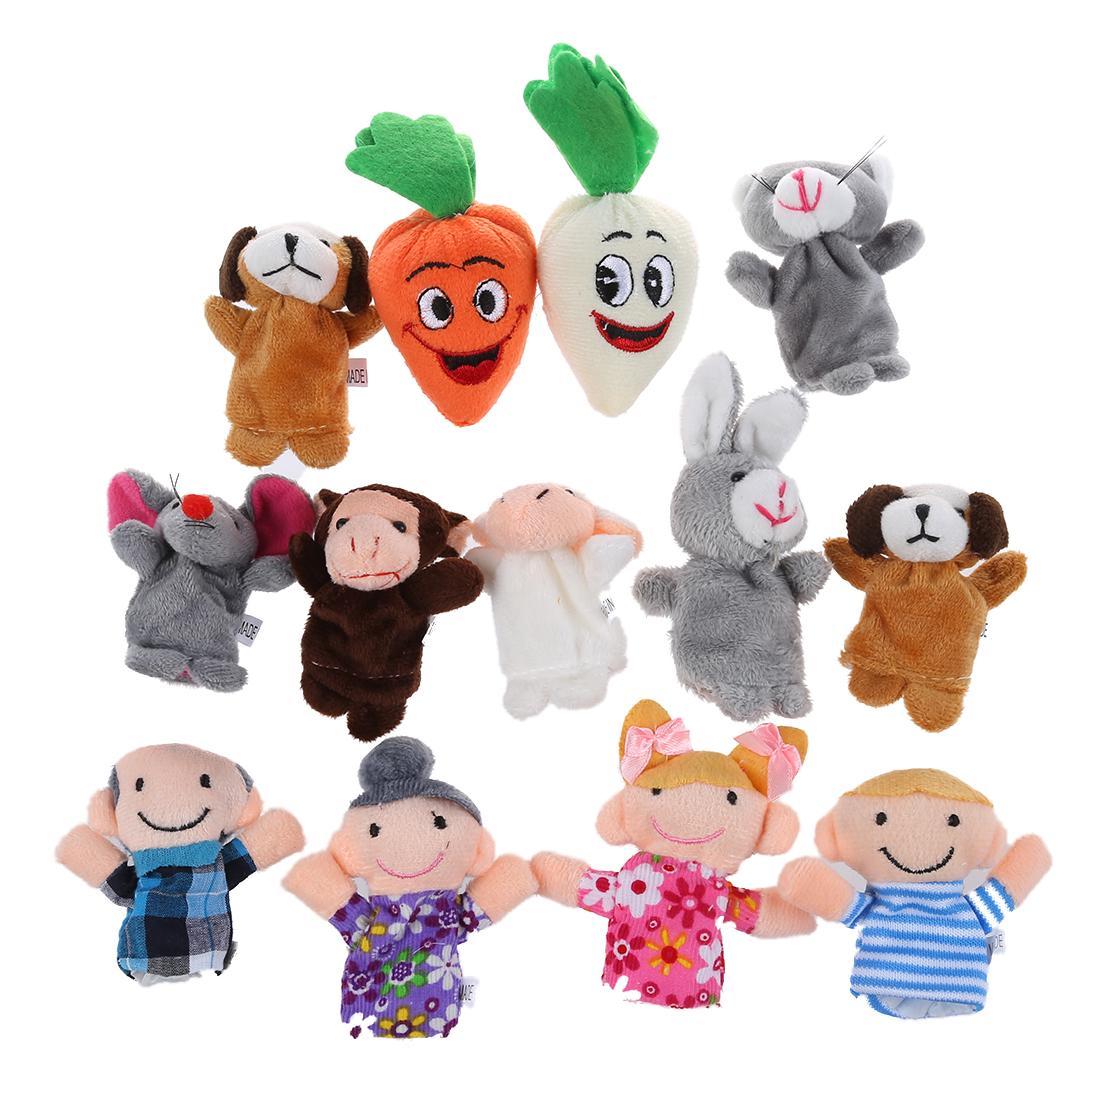 Baby Kids Educational toy Finger Puppet plush toys boy girl